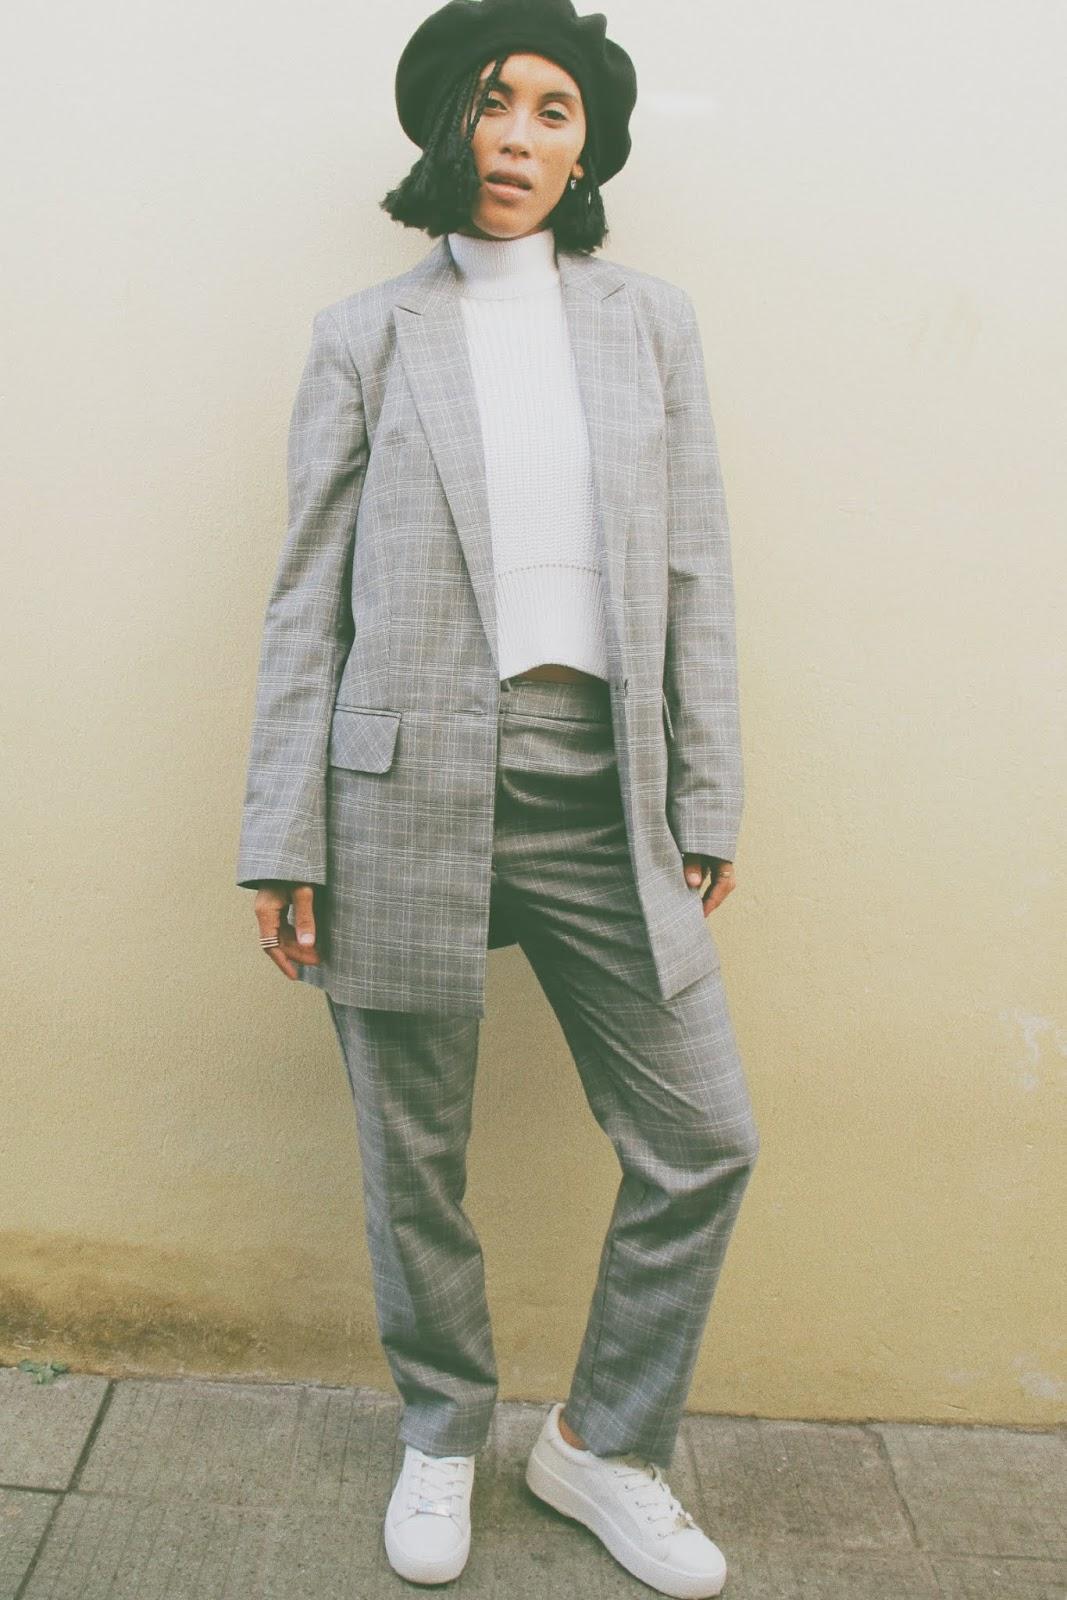 Liezel-Esquire-how-to-wear-a-suit